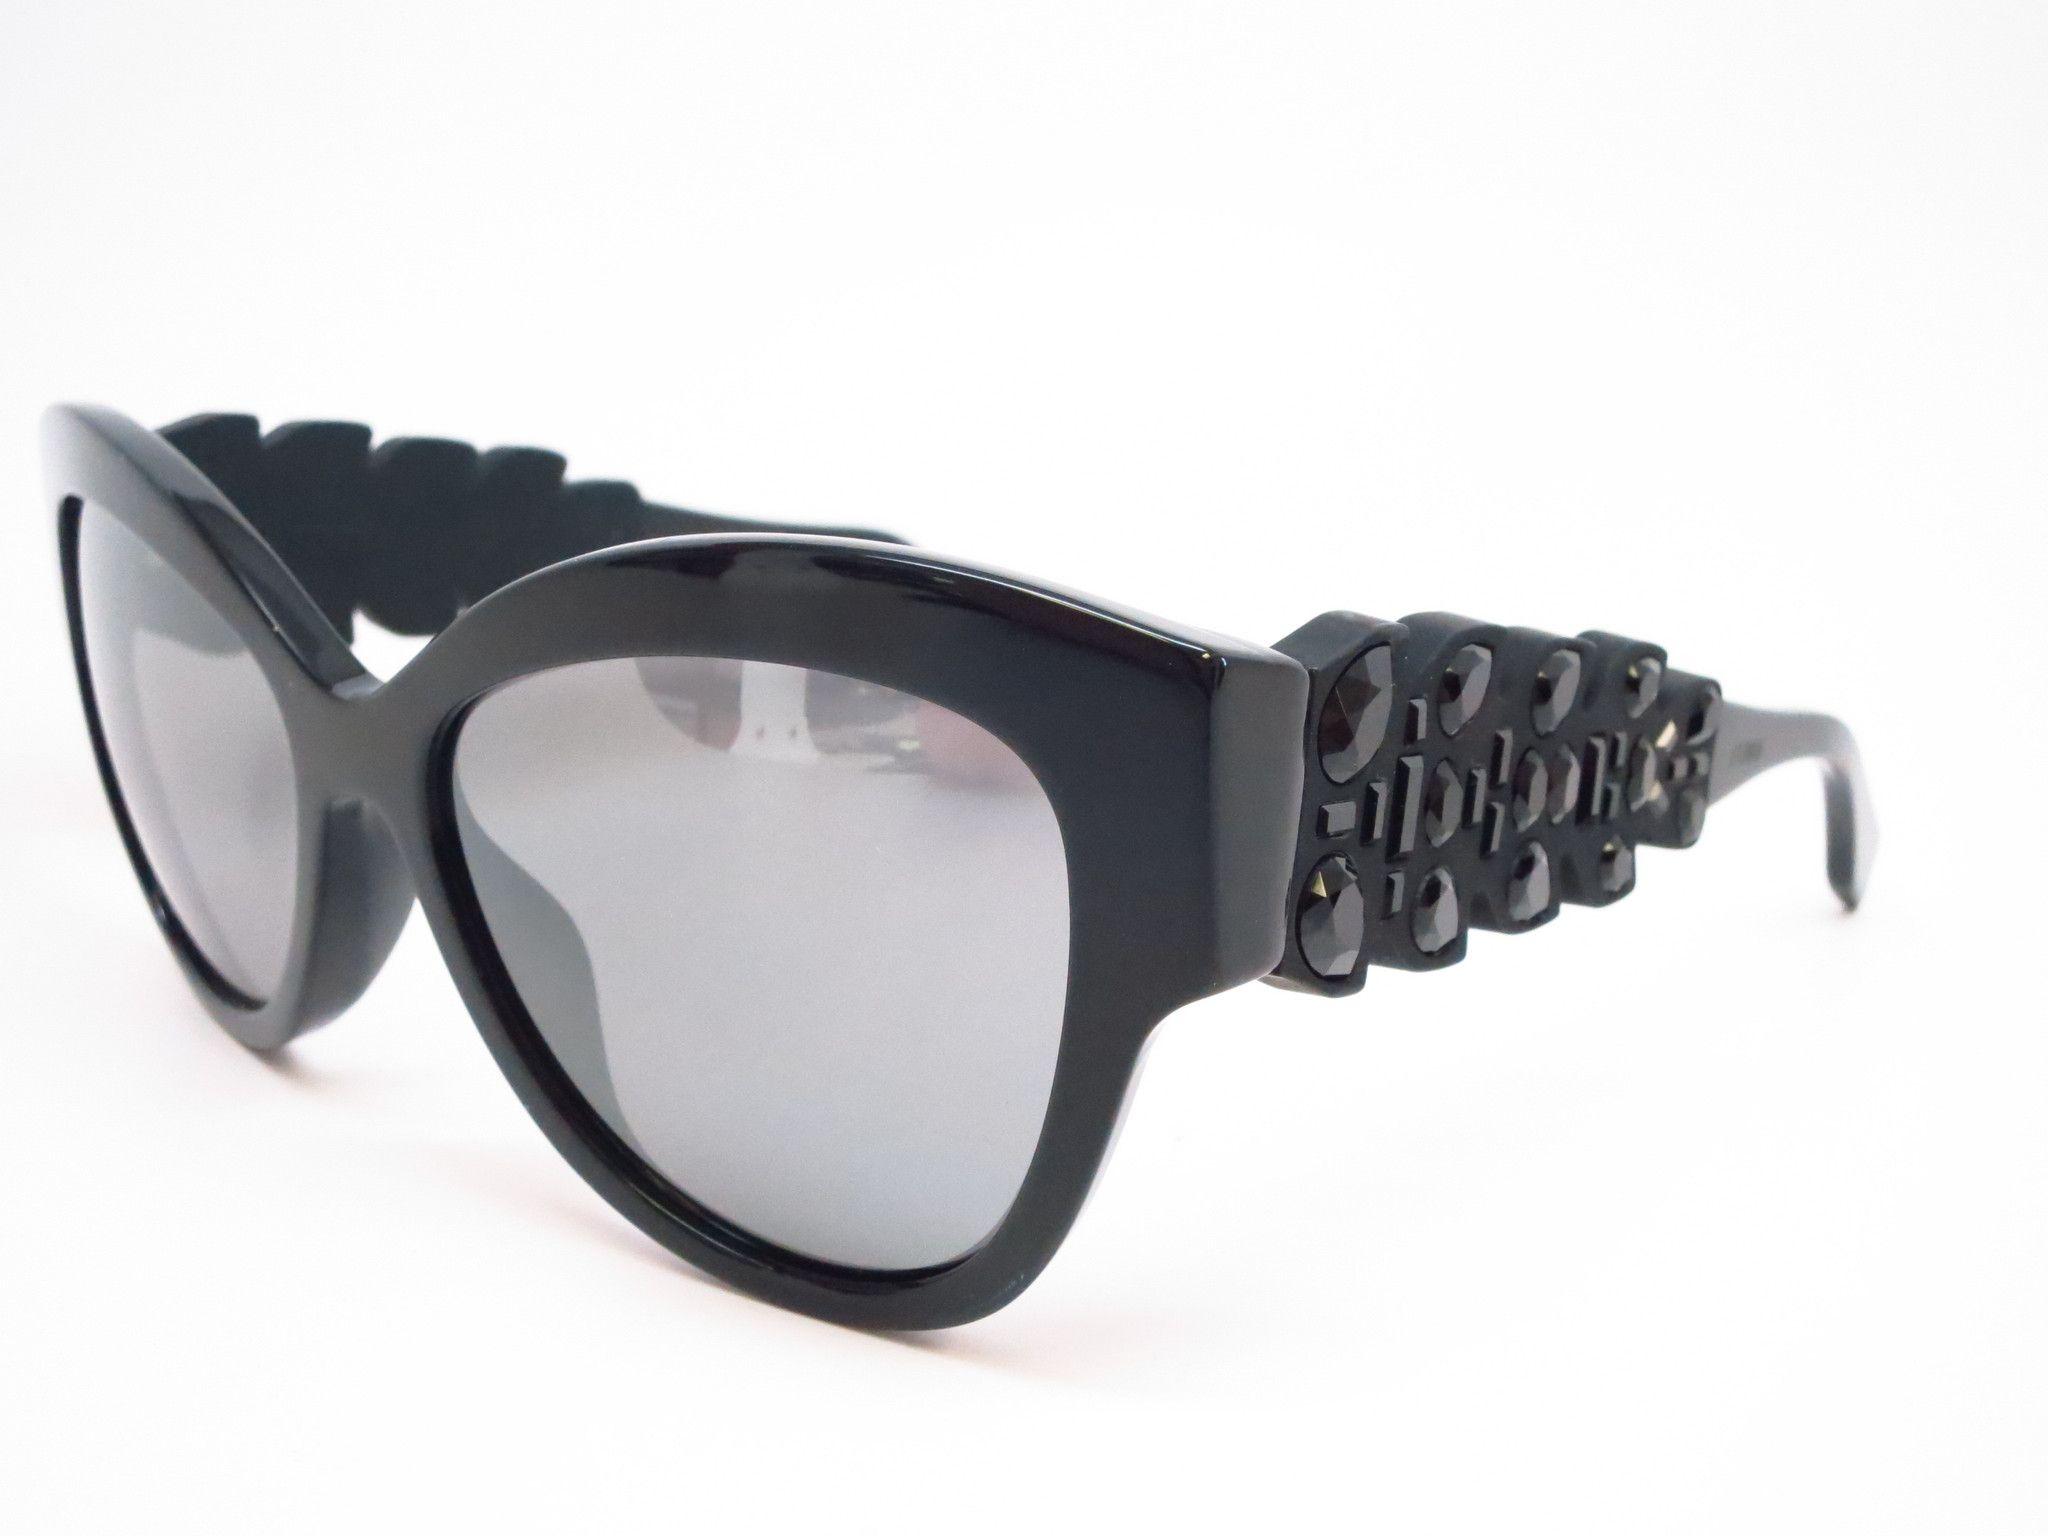 33f34ea40cf7 Fendi FF 138 29A IE Shiny Black Sunglasses 0138